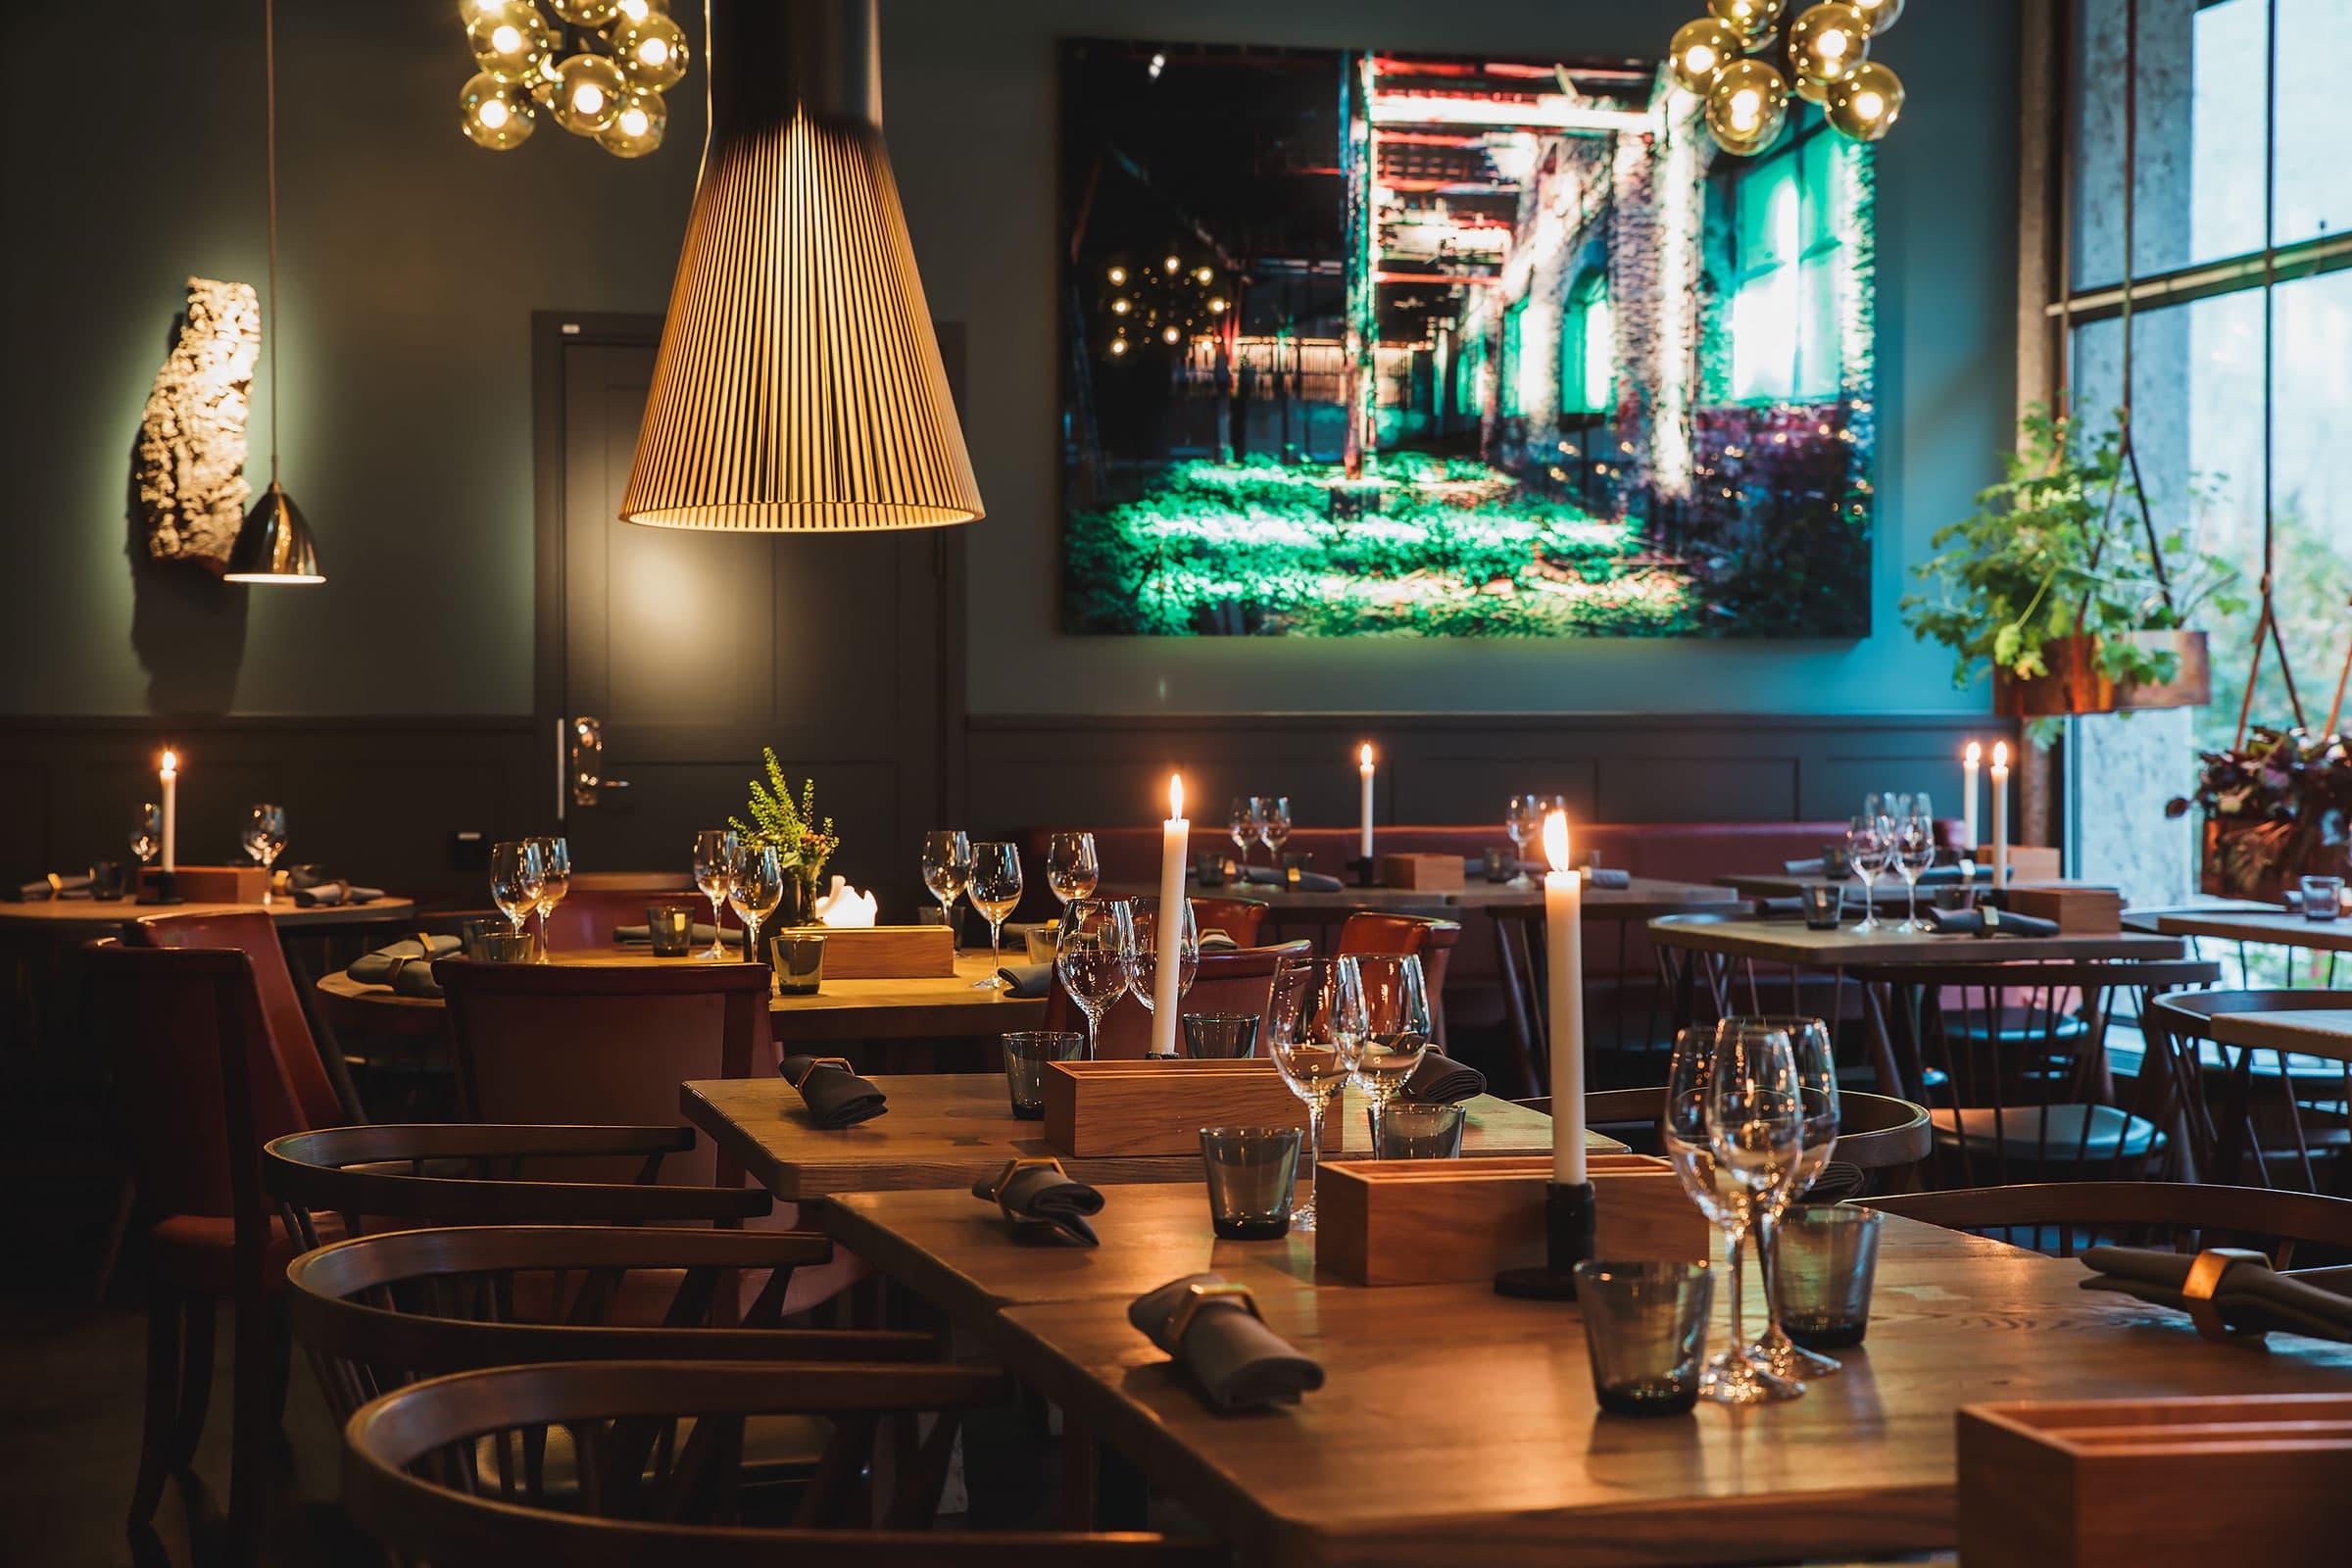 bra grill restaurang stockholm